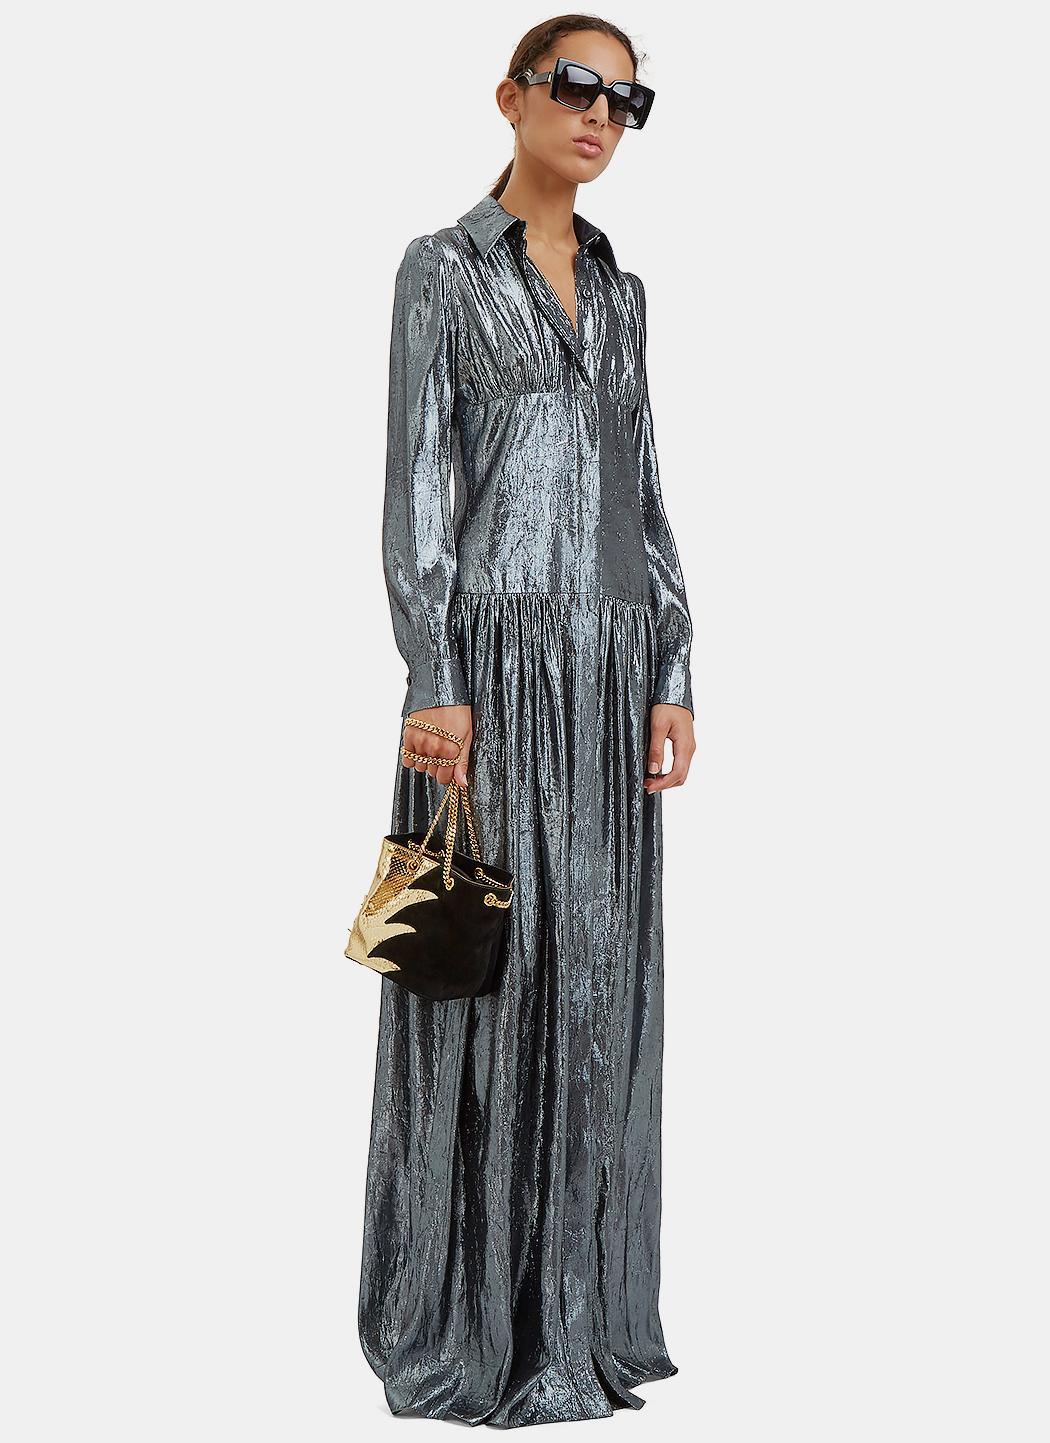 Lanvin women 39 s long metallic lurex shirt dress in silver for Silver metallic shirt women s